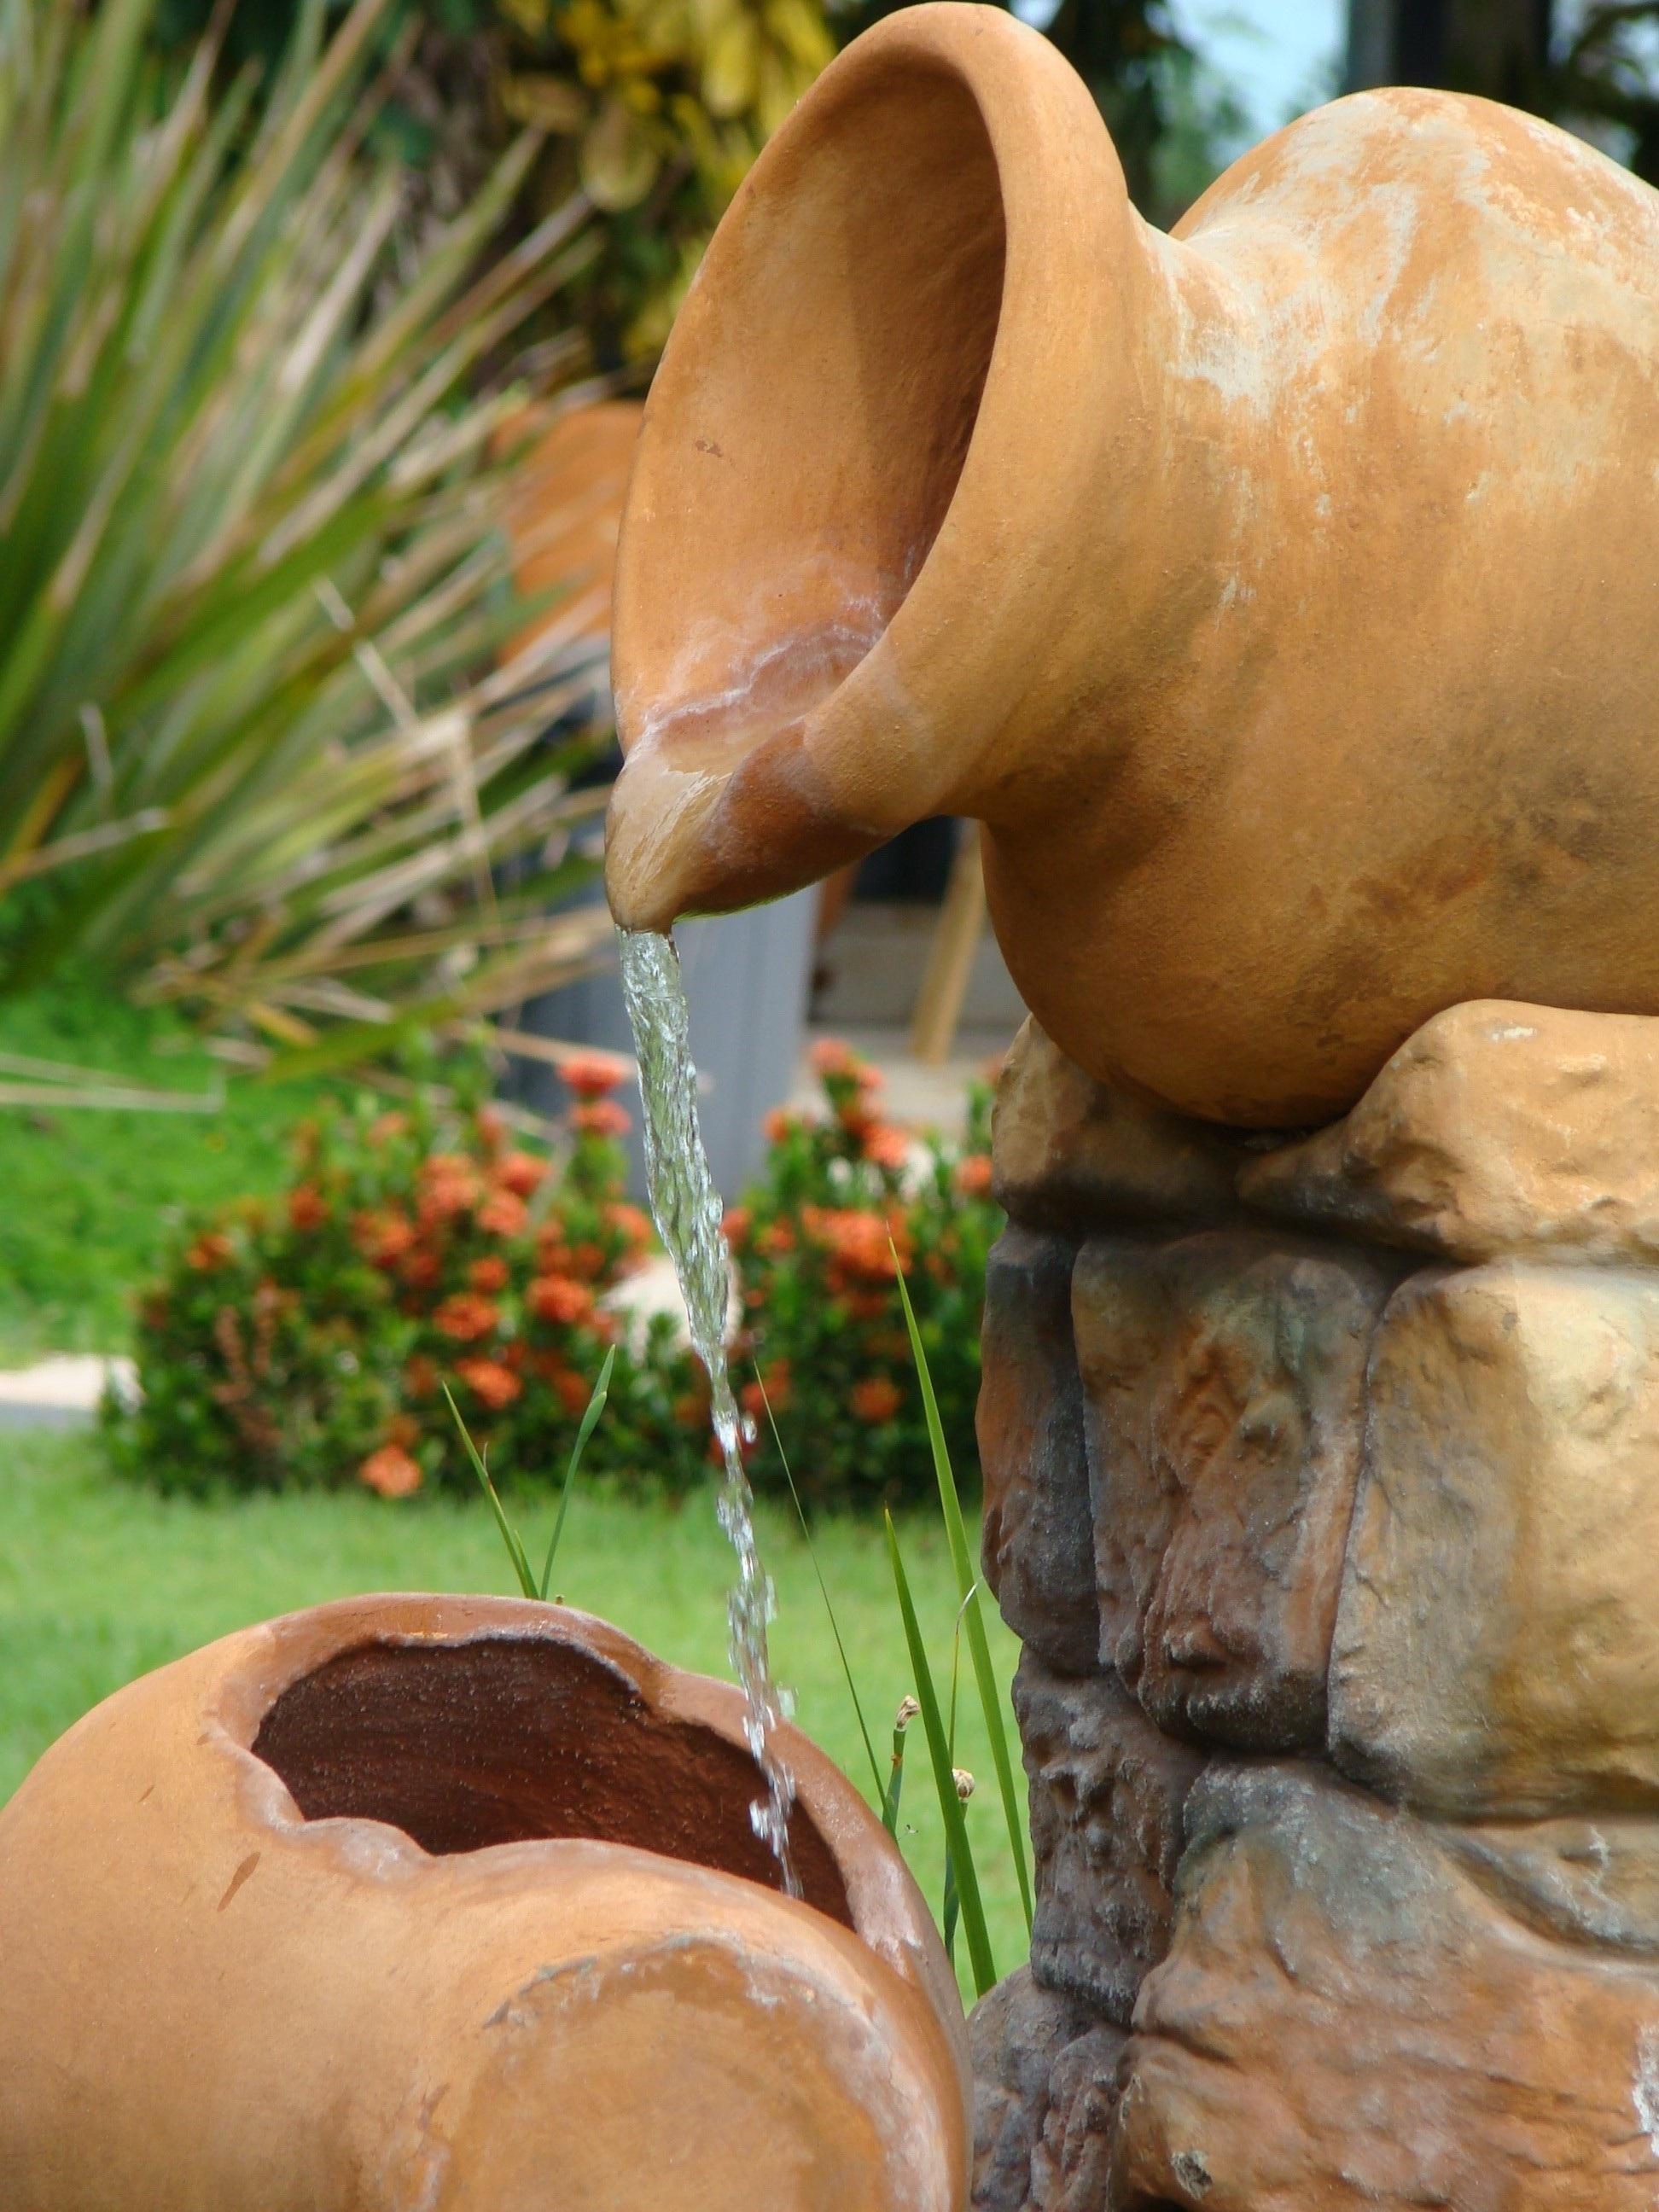 water wood mushroom garden sculpture art landscaping source carving man made object penny bun